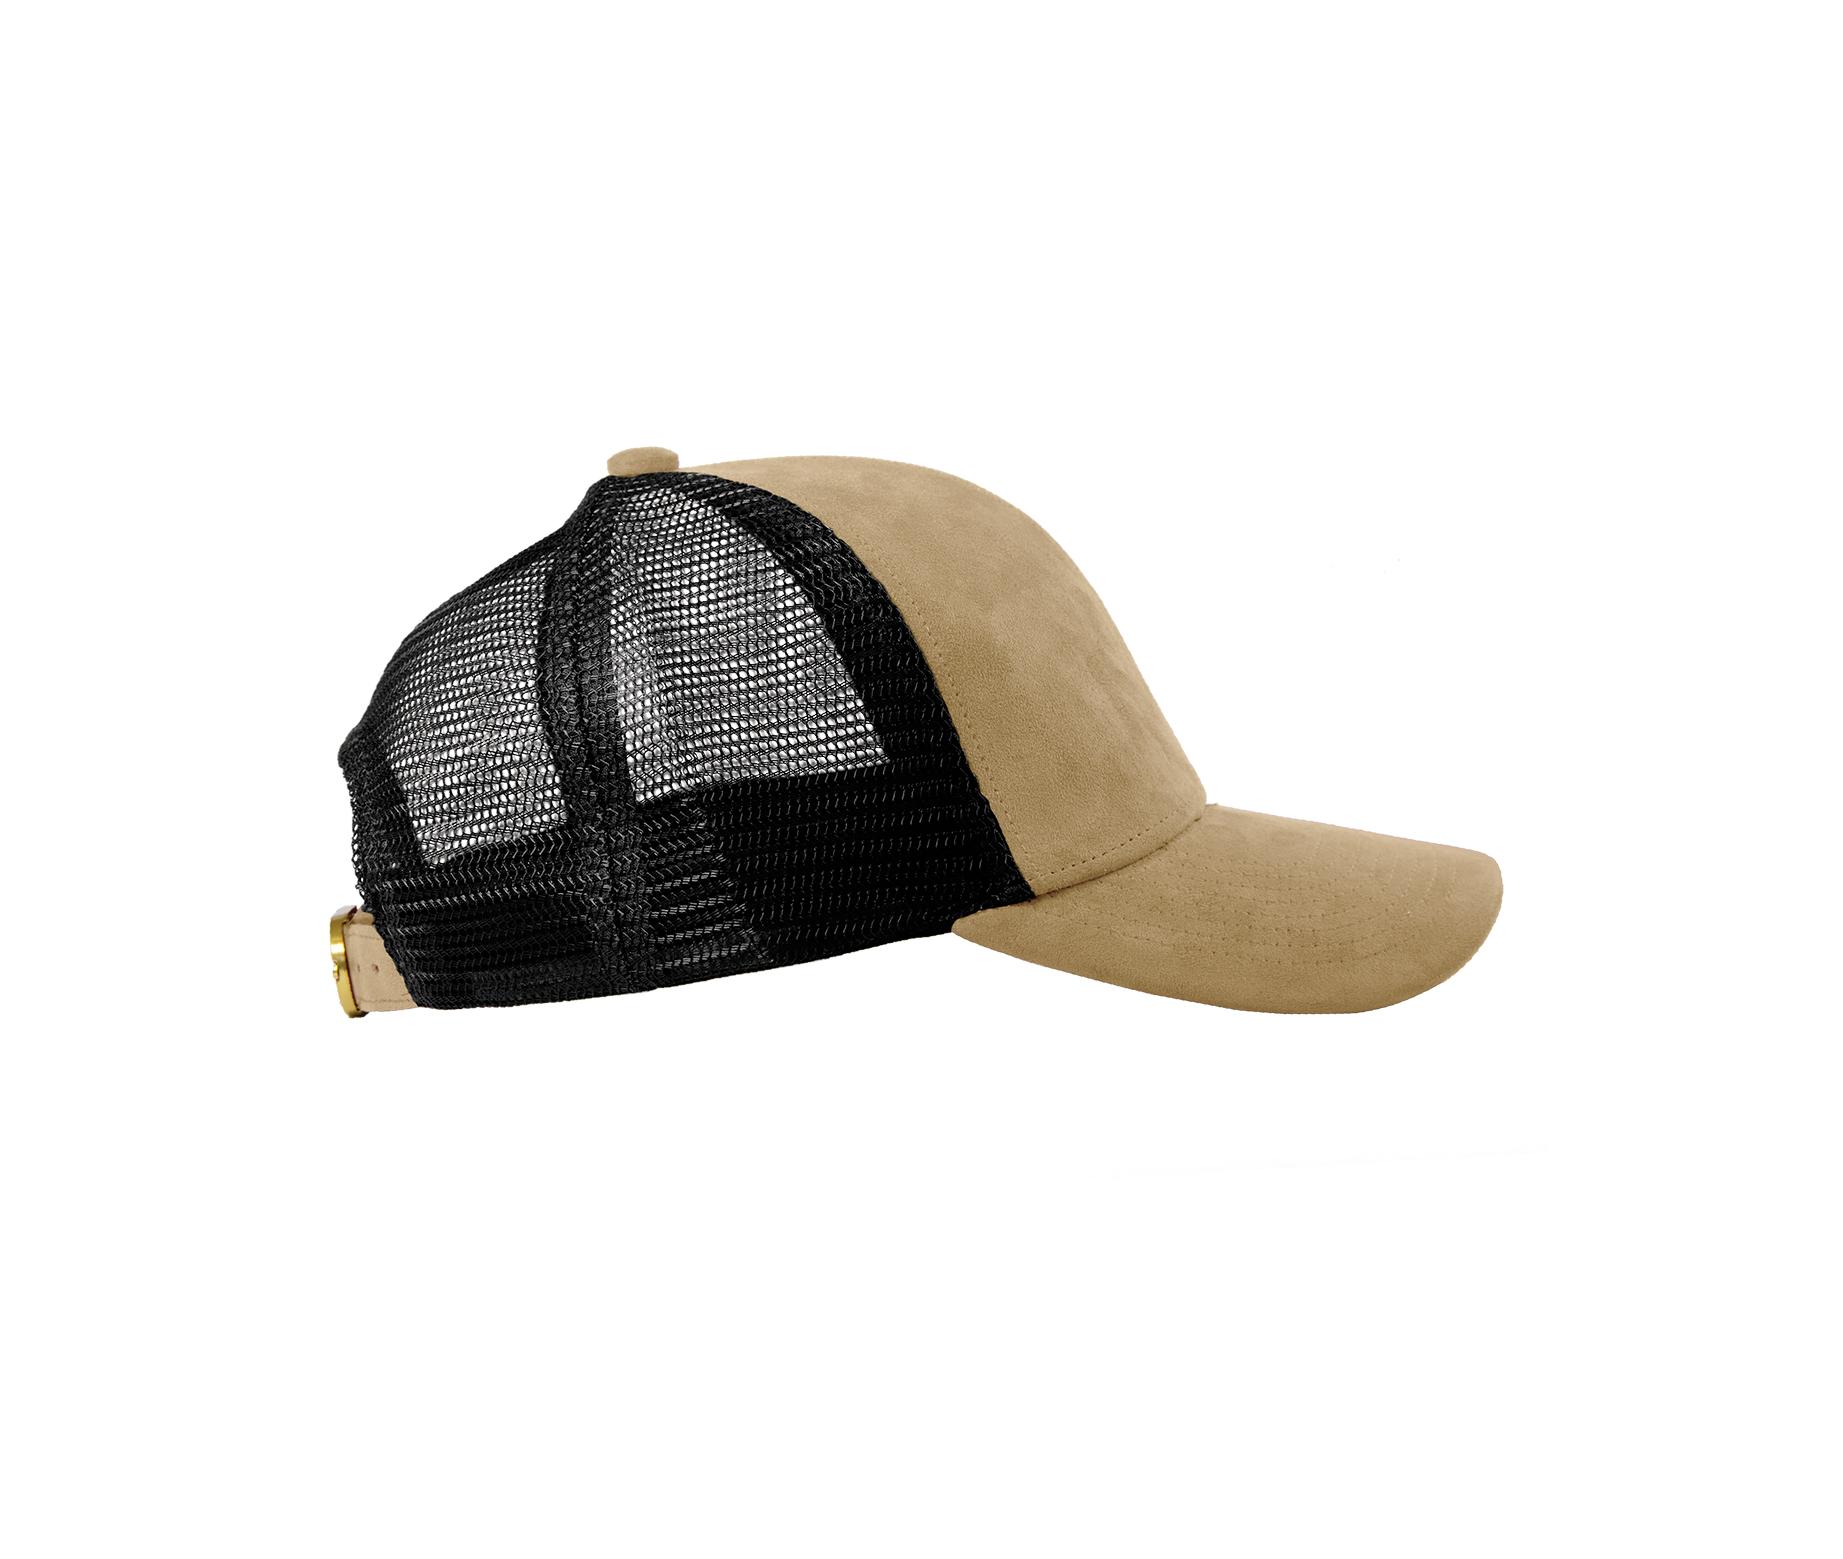 TRUCKER CAP SAND SUEDE SIDE